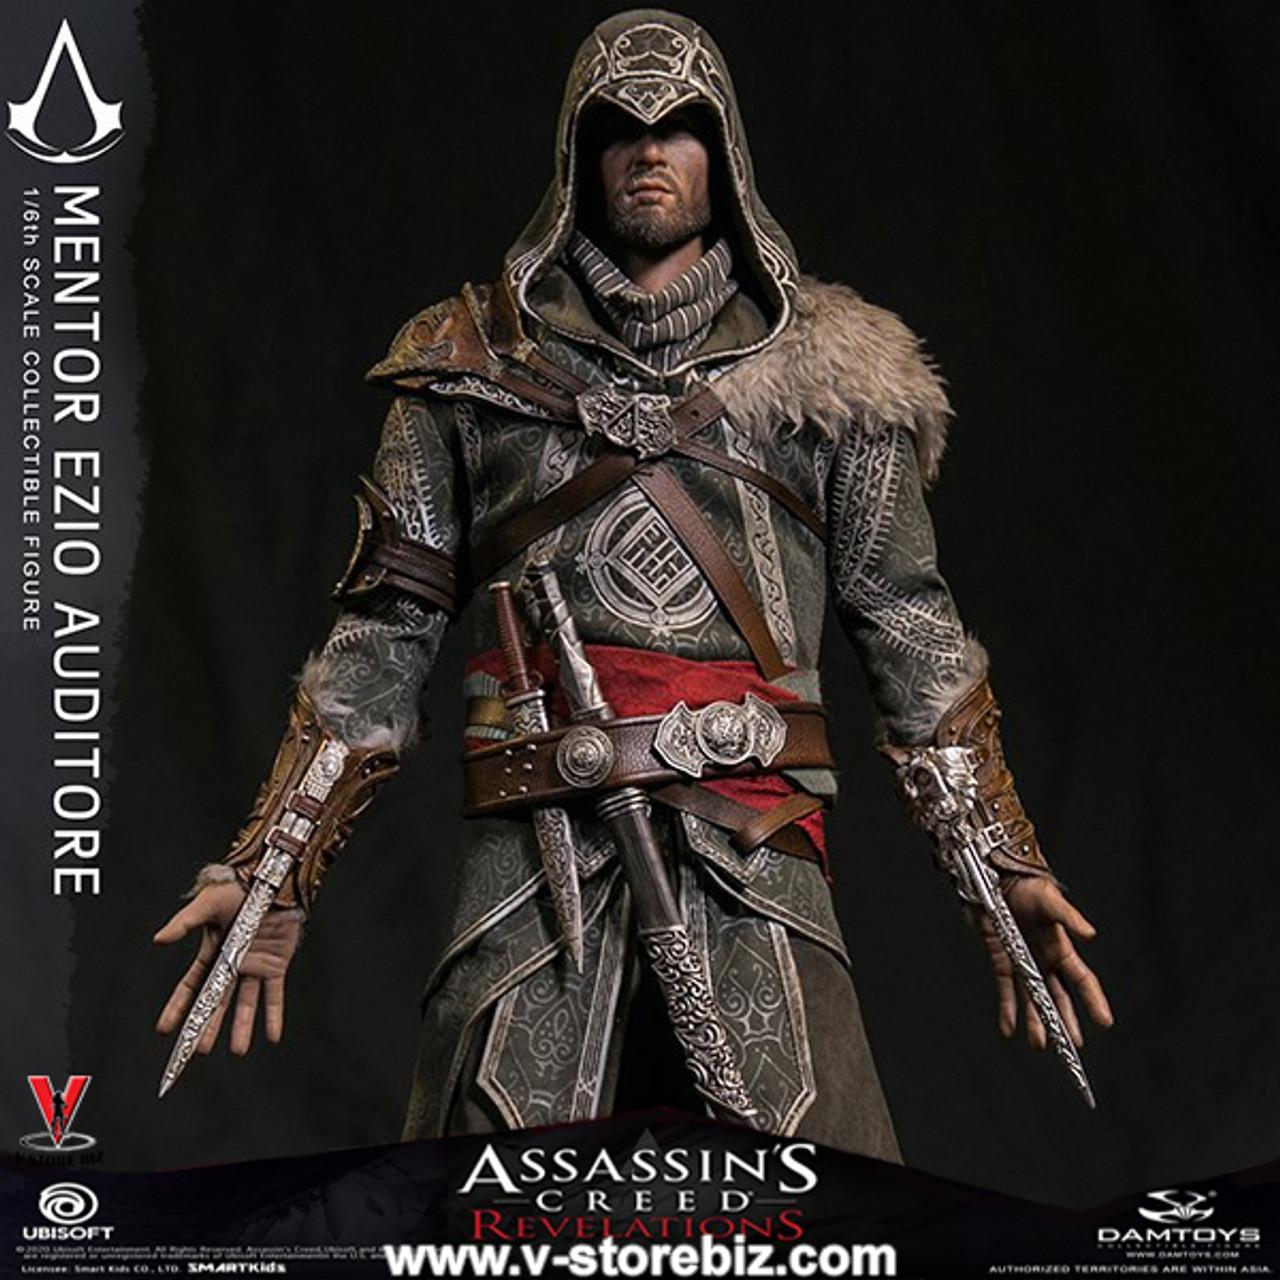 Dam Dms014 Assassin S Creed Revelations Mentor Ezio Auditore V